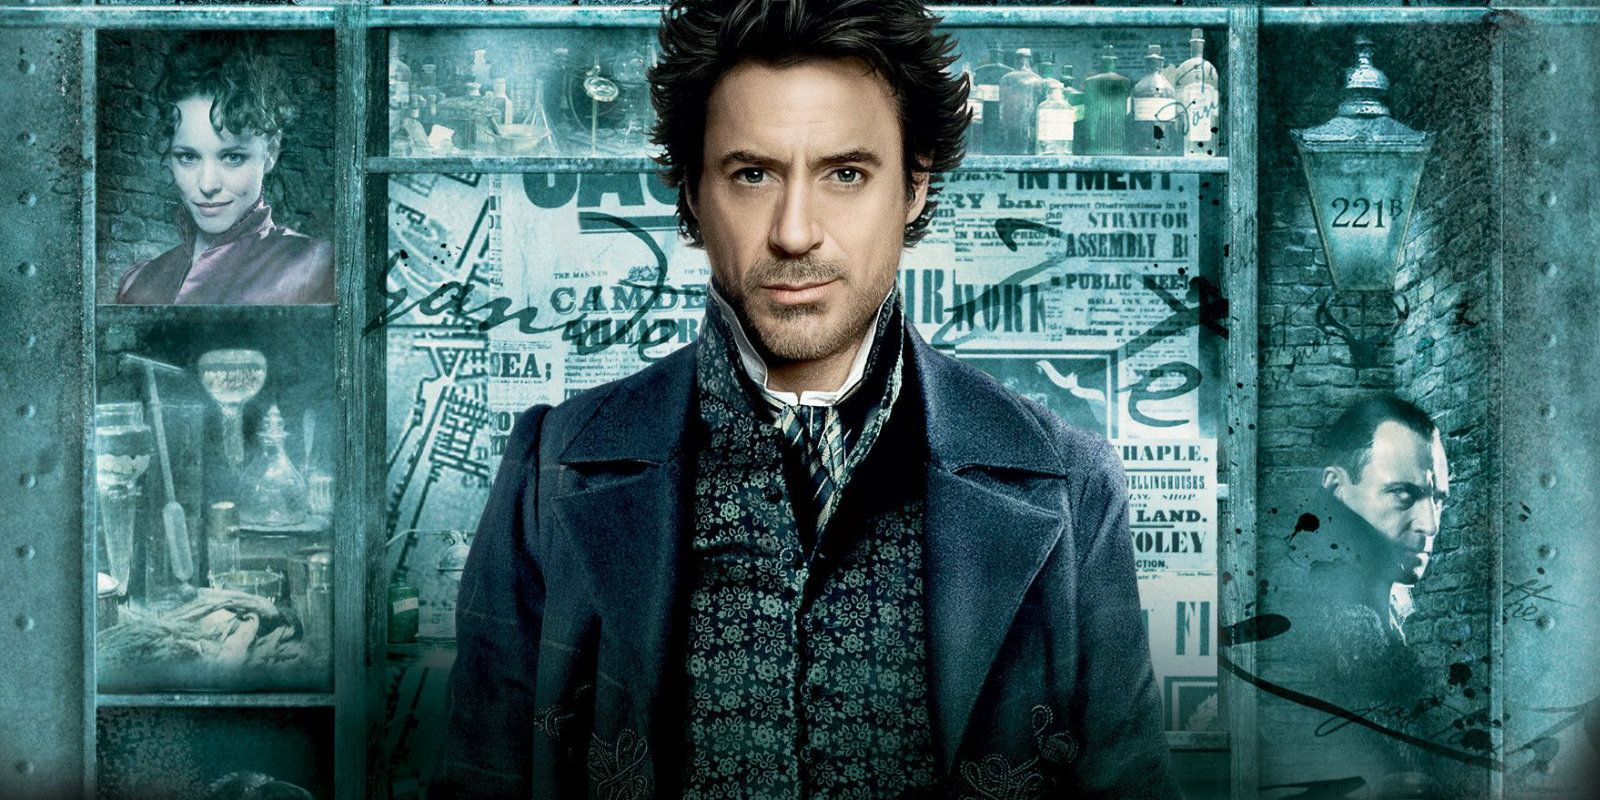 Robert Downey Jr. Wants To Make Sherlock Holmes The Next MCU